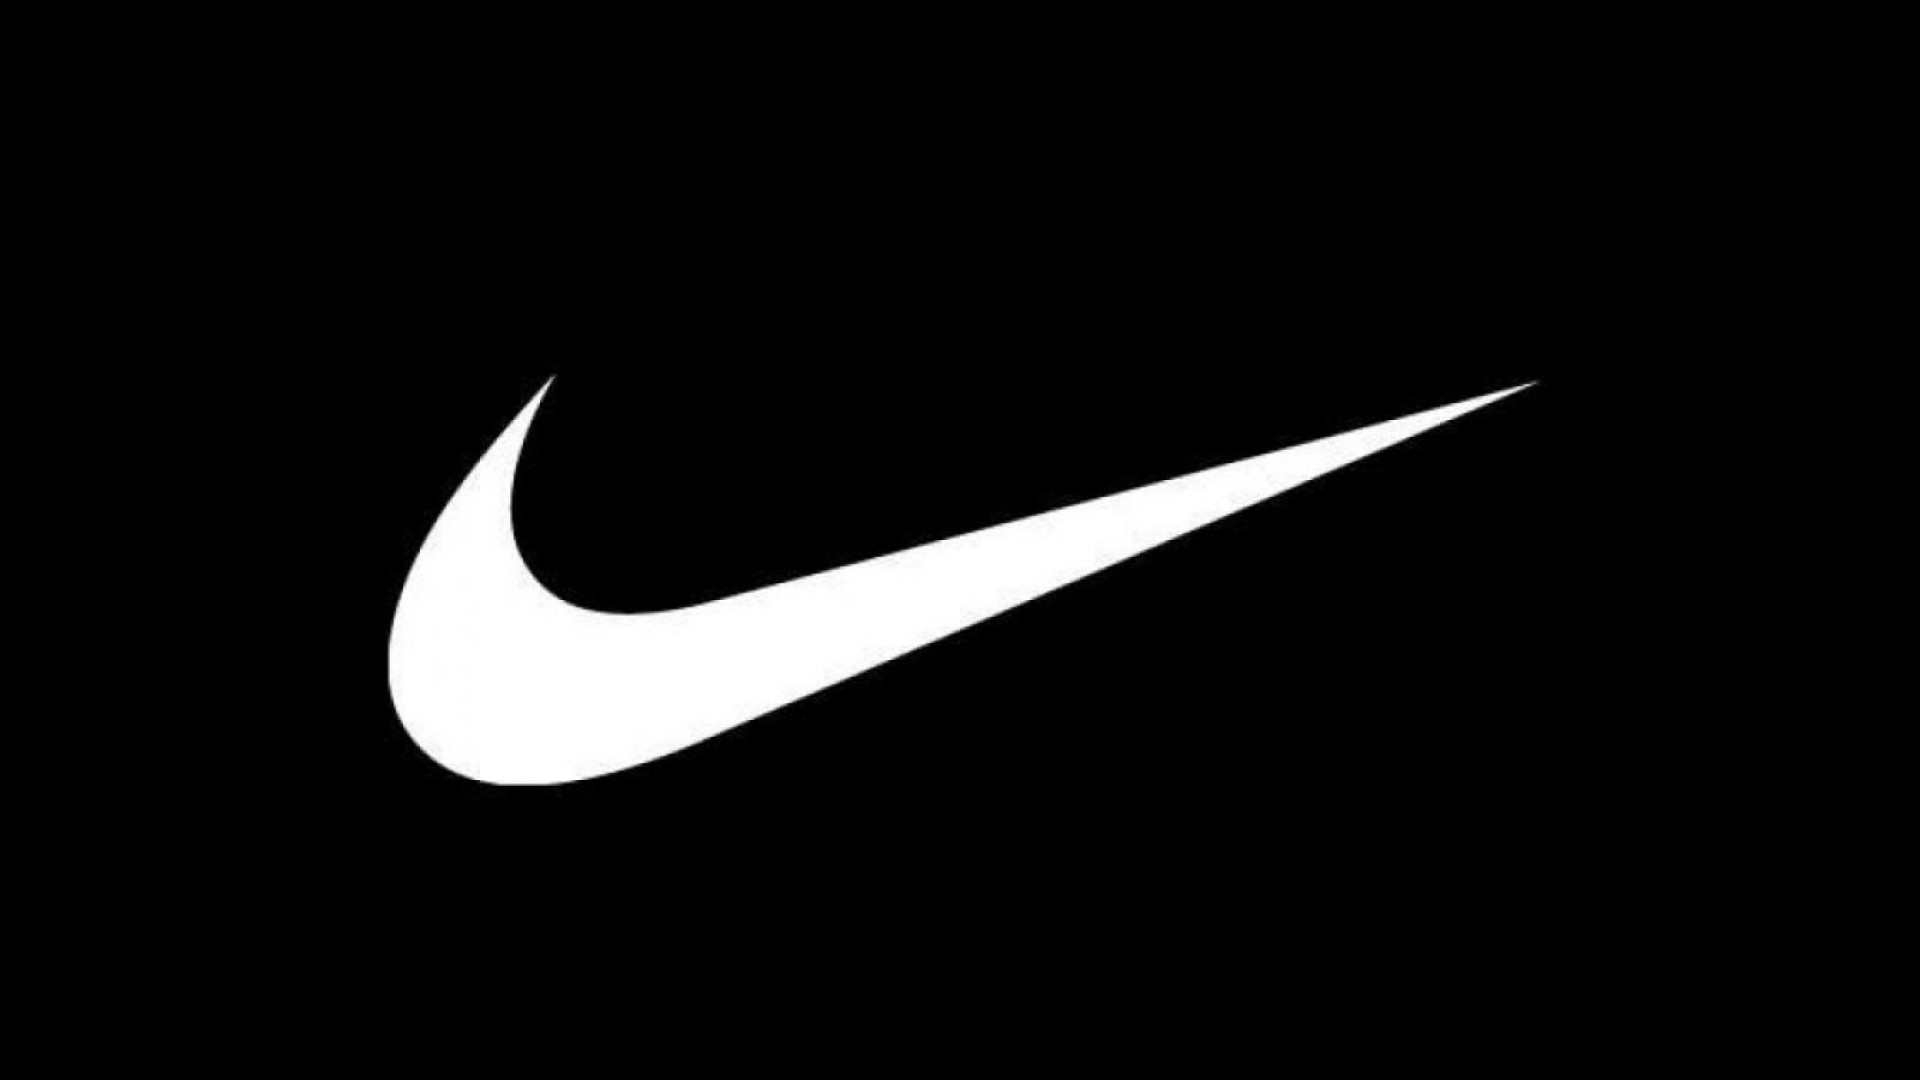 Nike Basketball Wallpaper Hd 1080p Nike Wallpaper HD 1080...